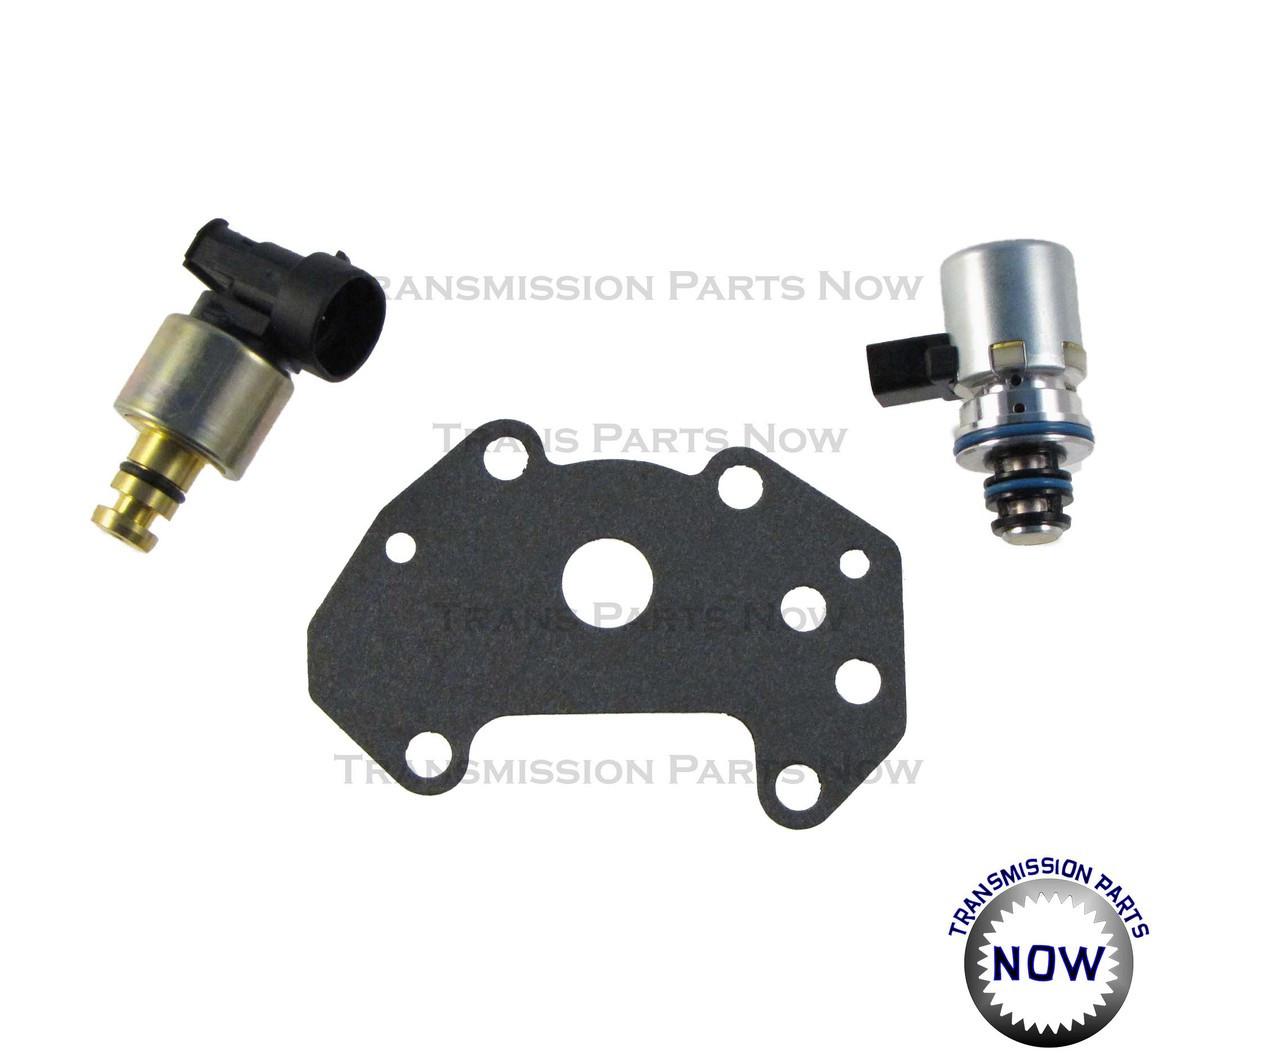 A500 A518 42RE 46RE Governor Pressure Sensor Solenoid Kit for 96-99 Dodge Jeep